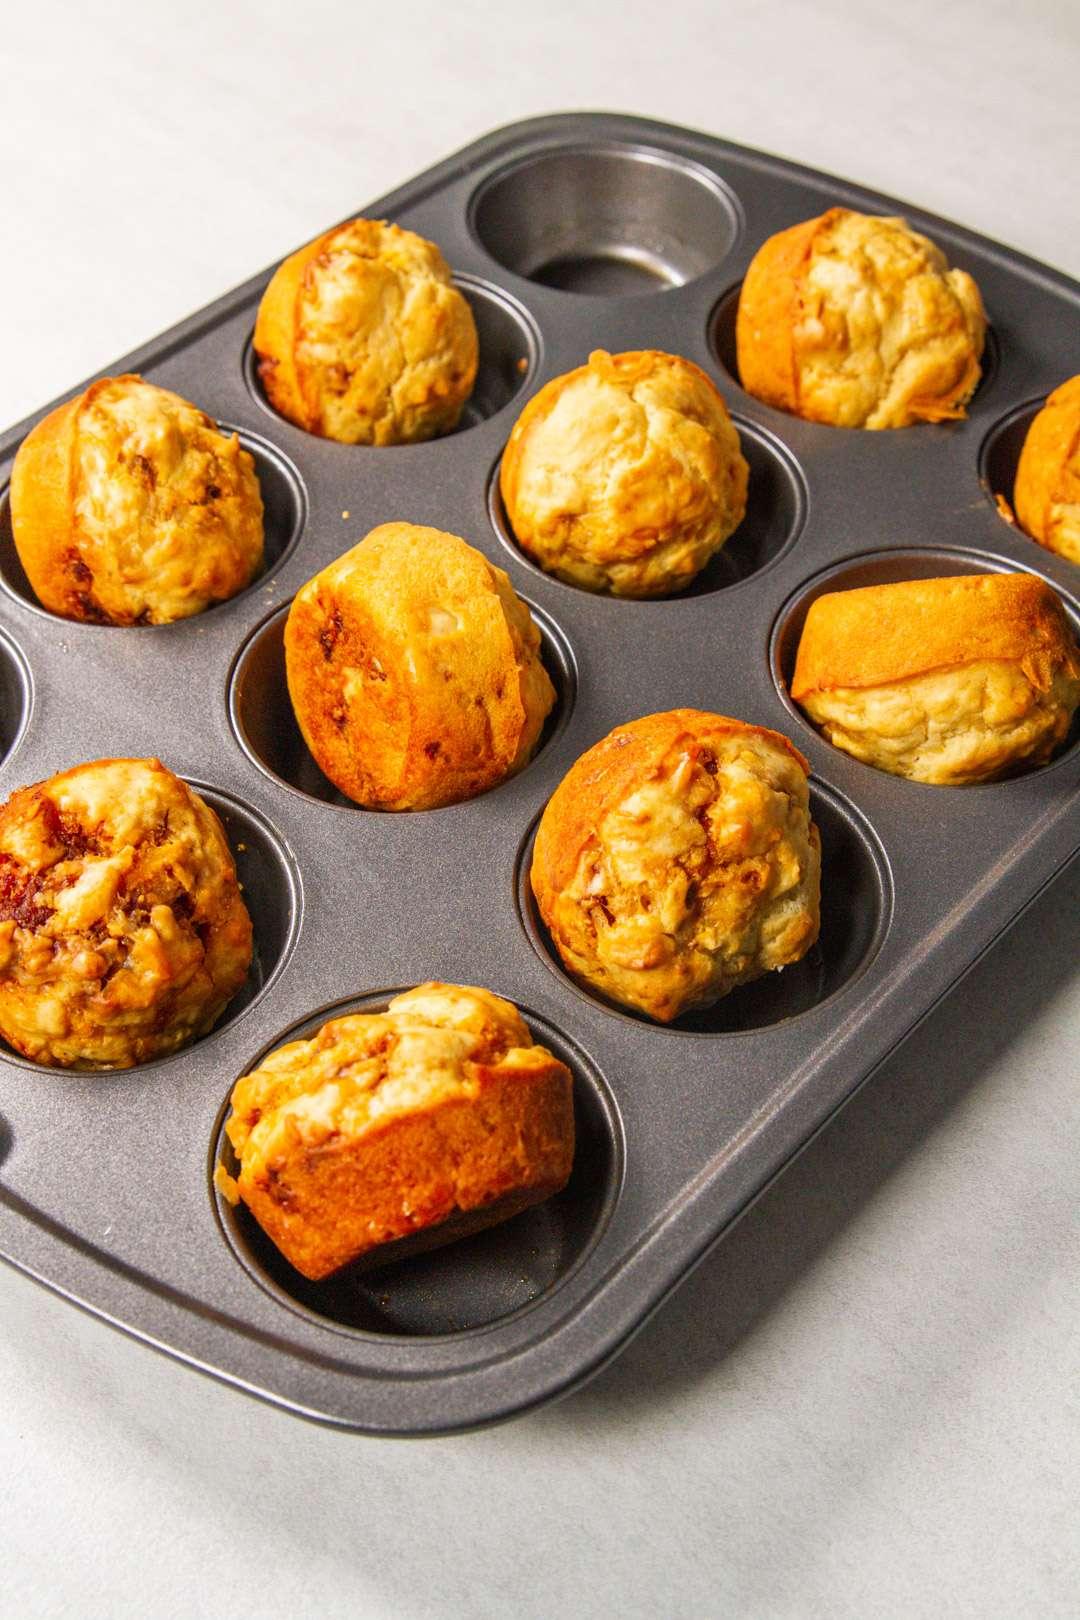 5 ingredient parmesan chorizo muffin on their side